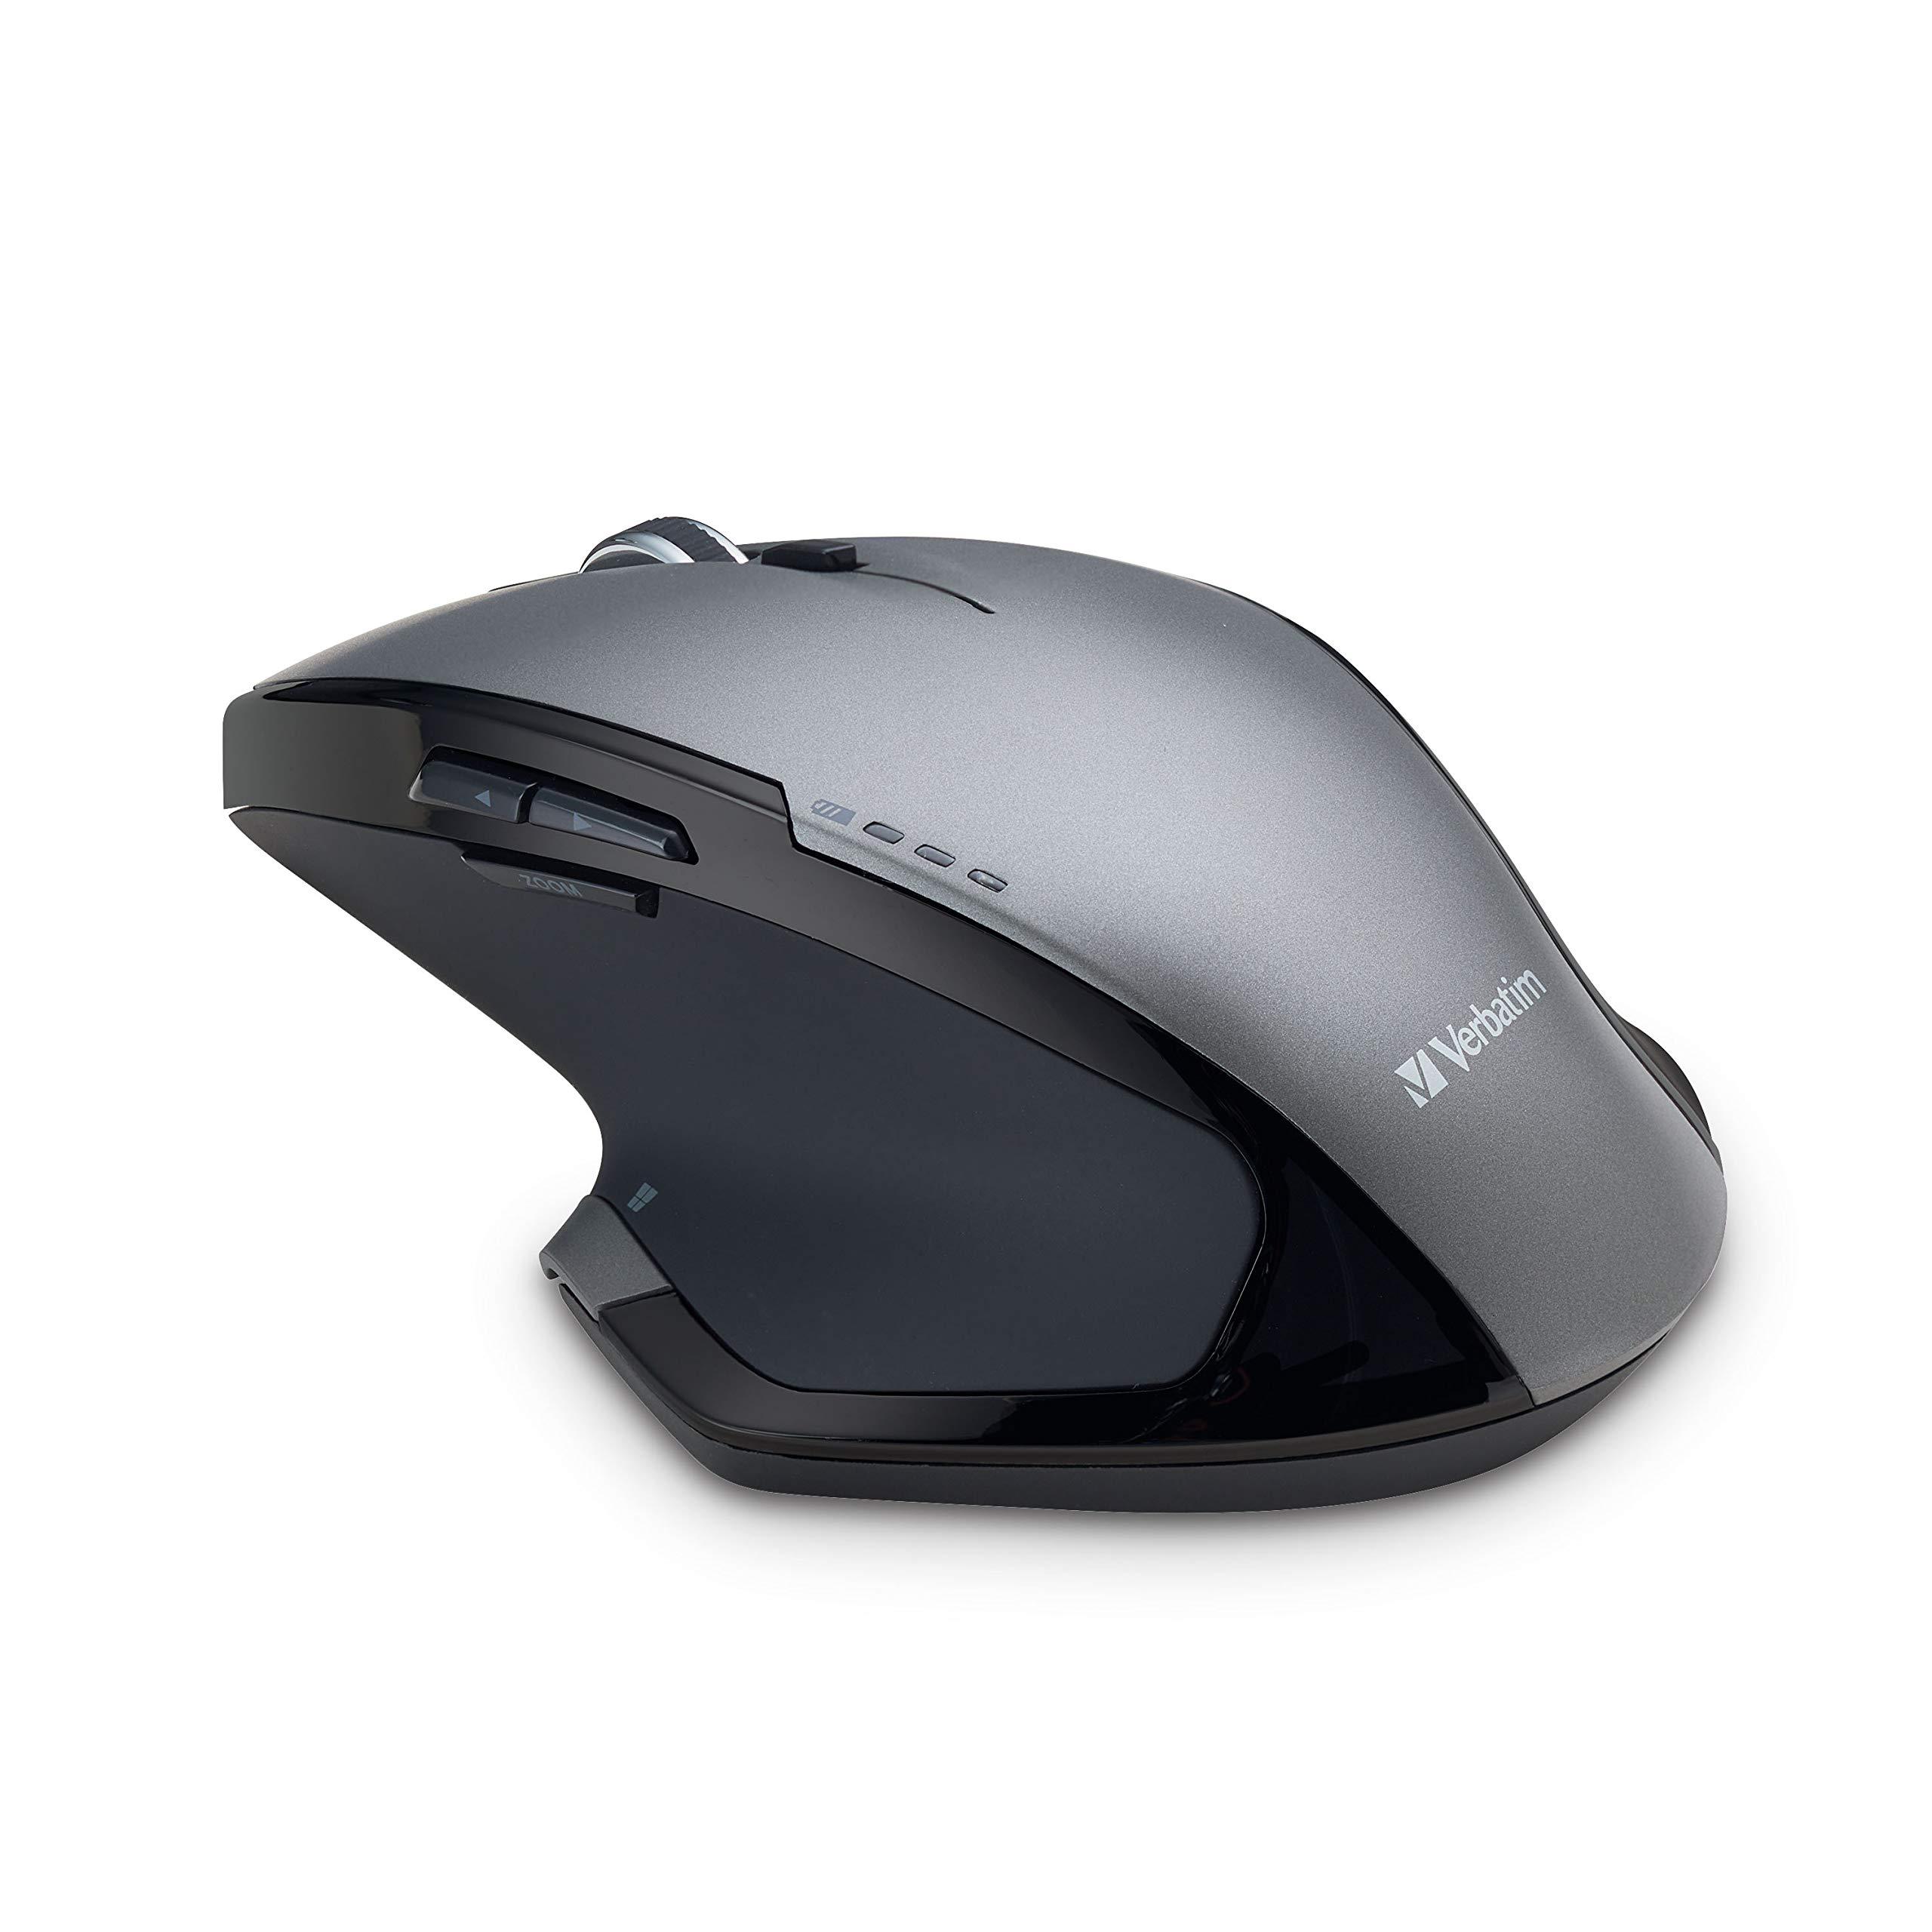 Verbatim Wireless Desktop 8-Button Deluxe Mouse - Ergonomic, Blue LED, Portable Mouse for Mac and Windows – Black (98622),Graphite